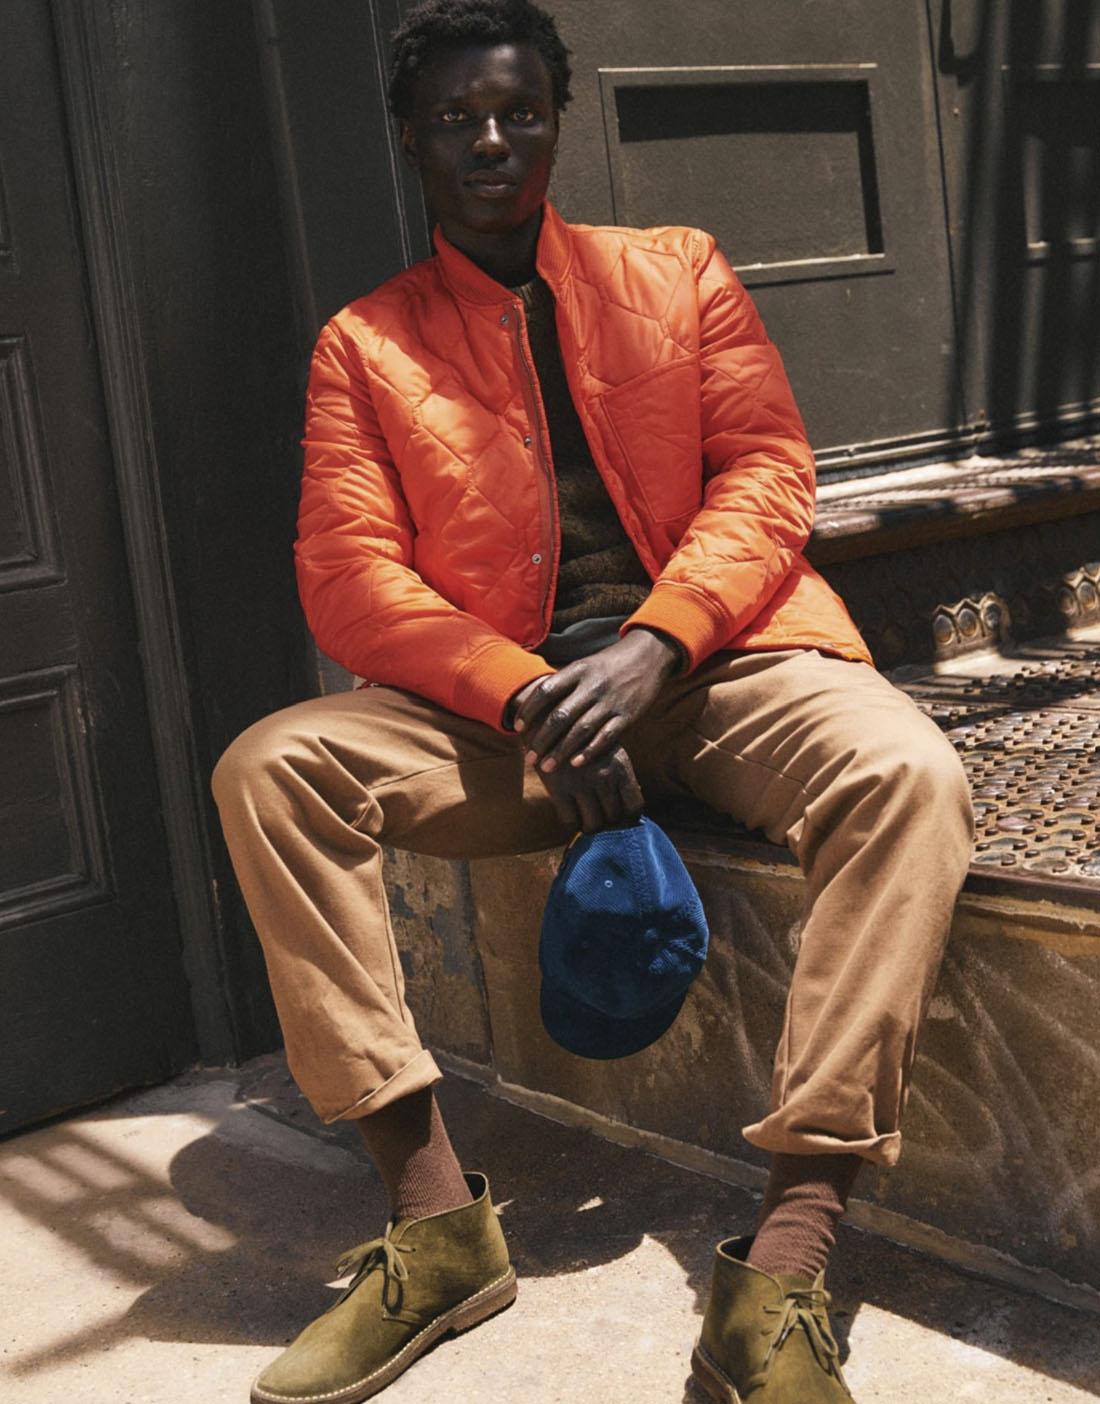 man sitting down wearing an orange jacket khaki pants and holding a blue hat